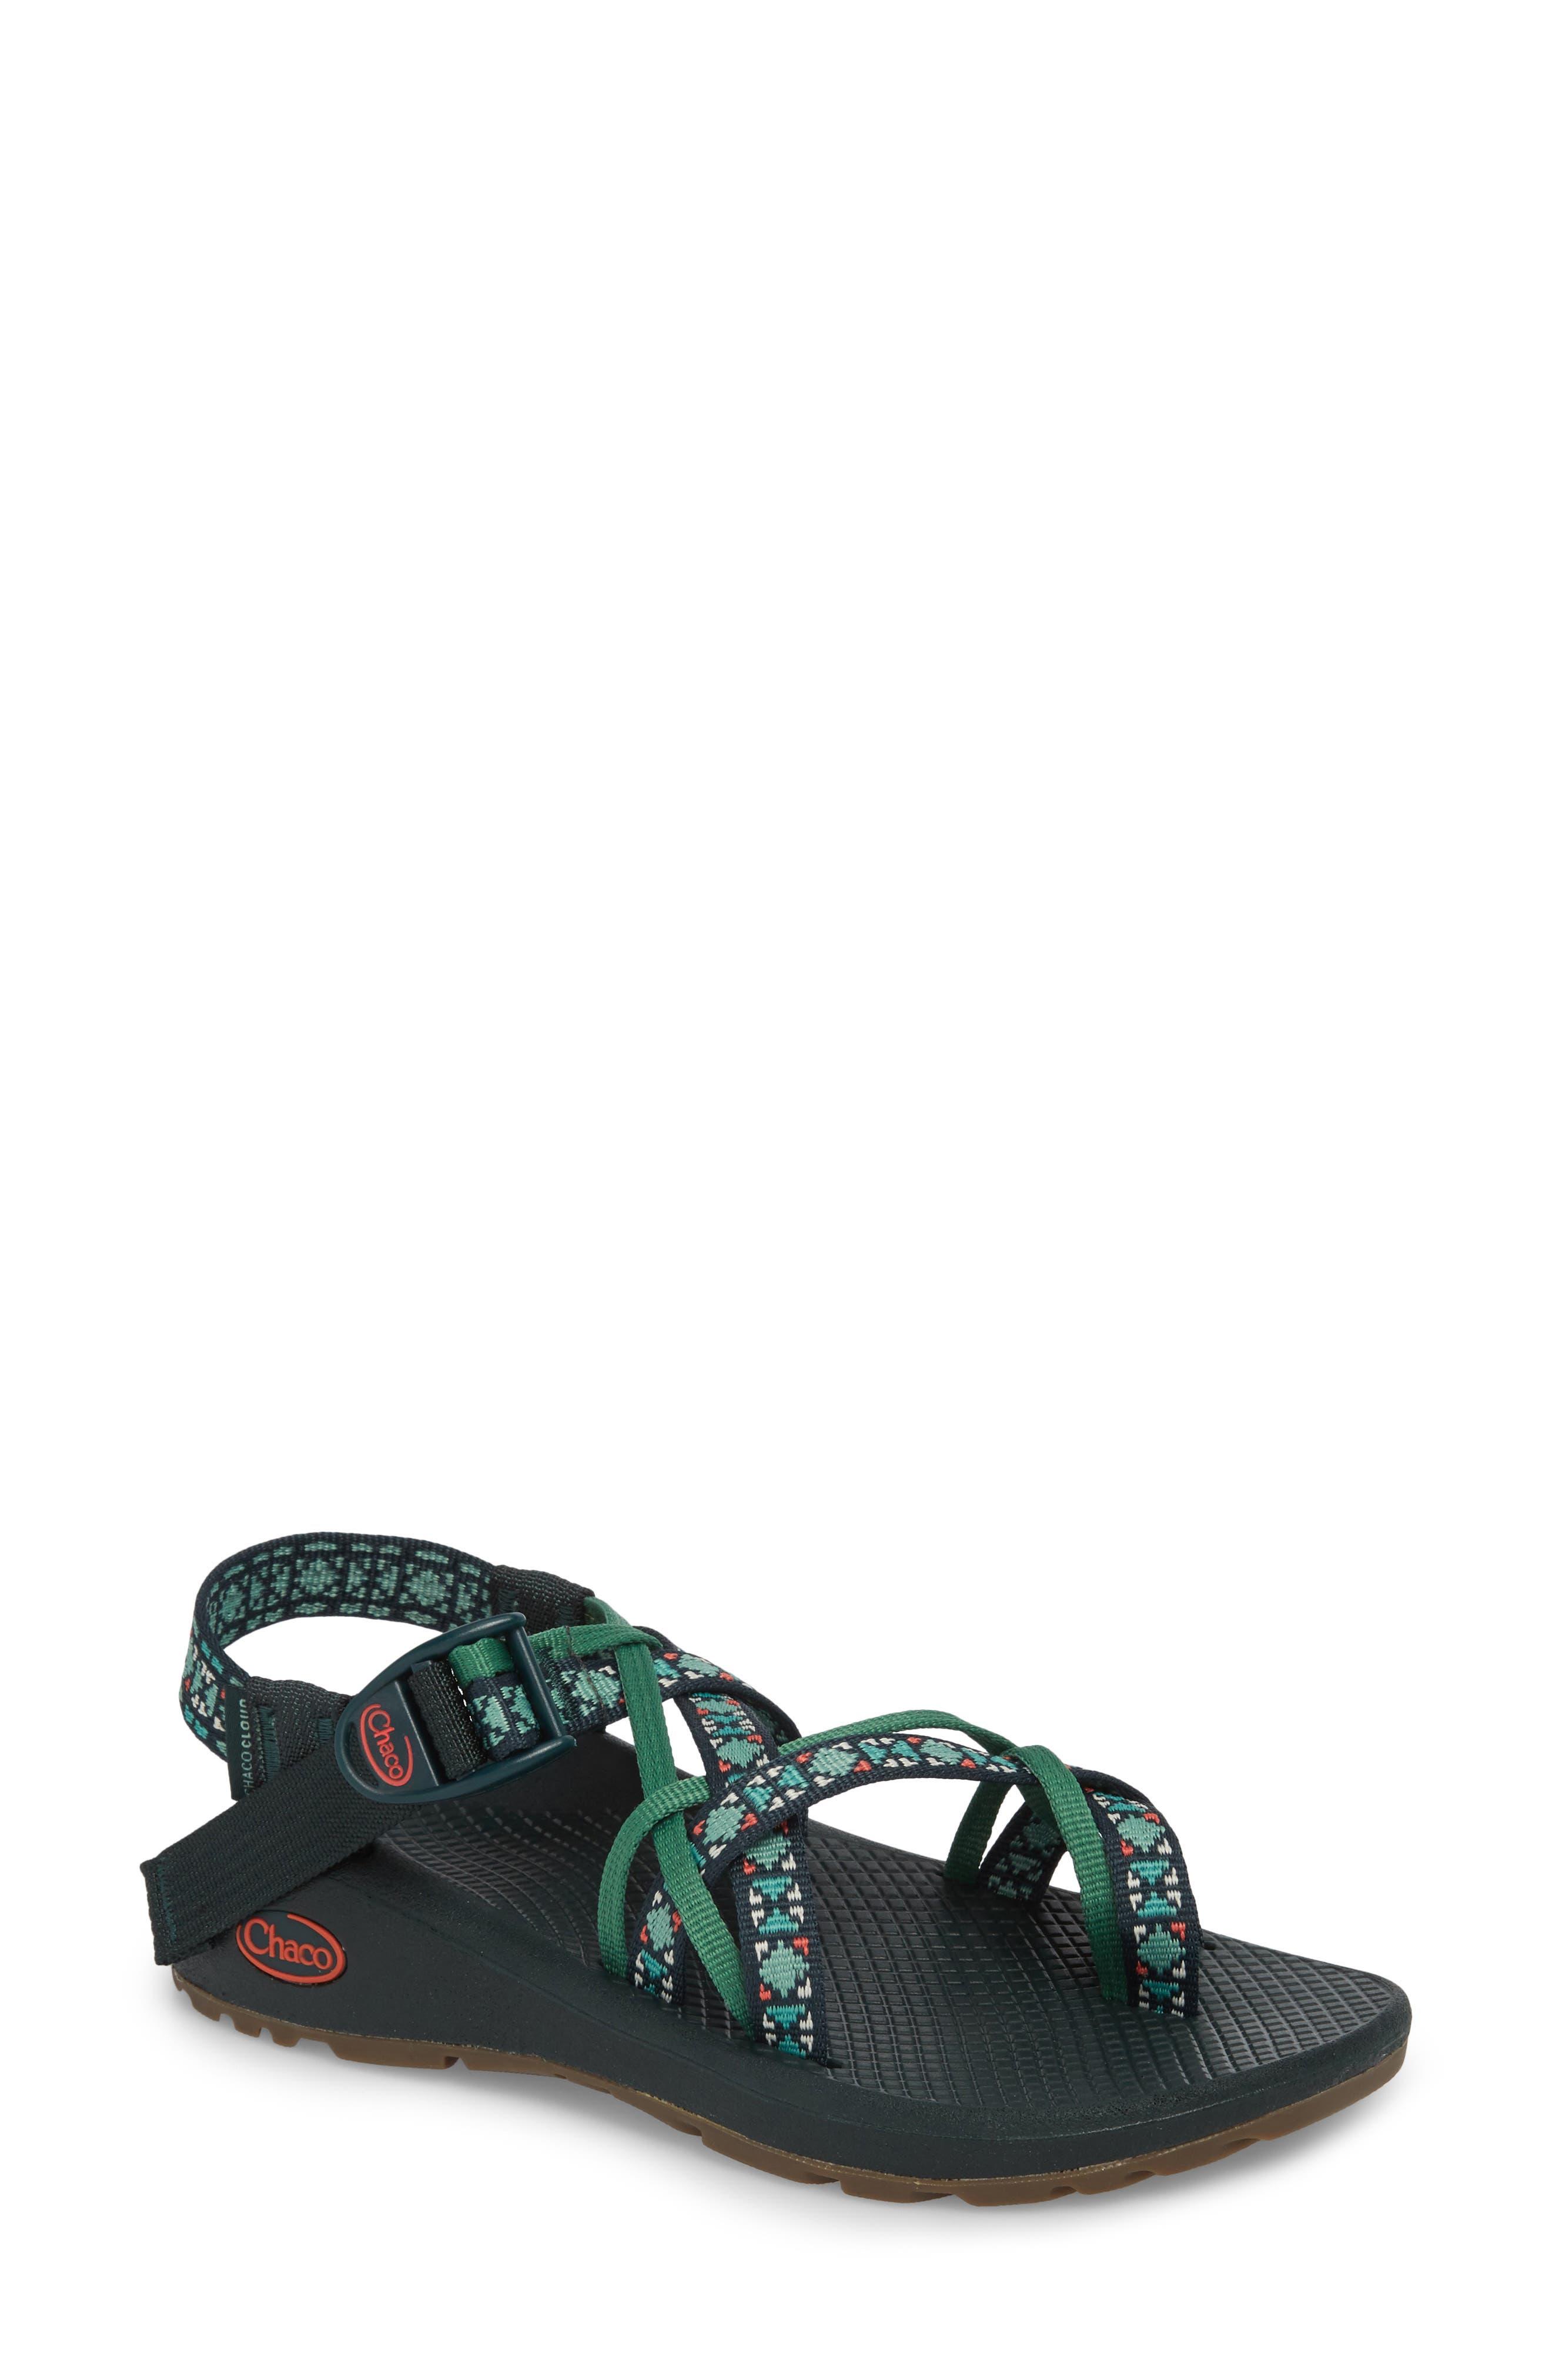 Z/Cloud X2 Remix Sport Sandal,                             Main thumbnail 1, color,                             Creed Pine